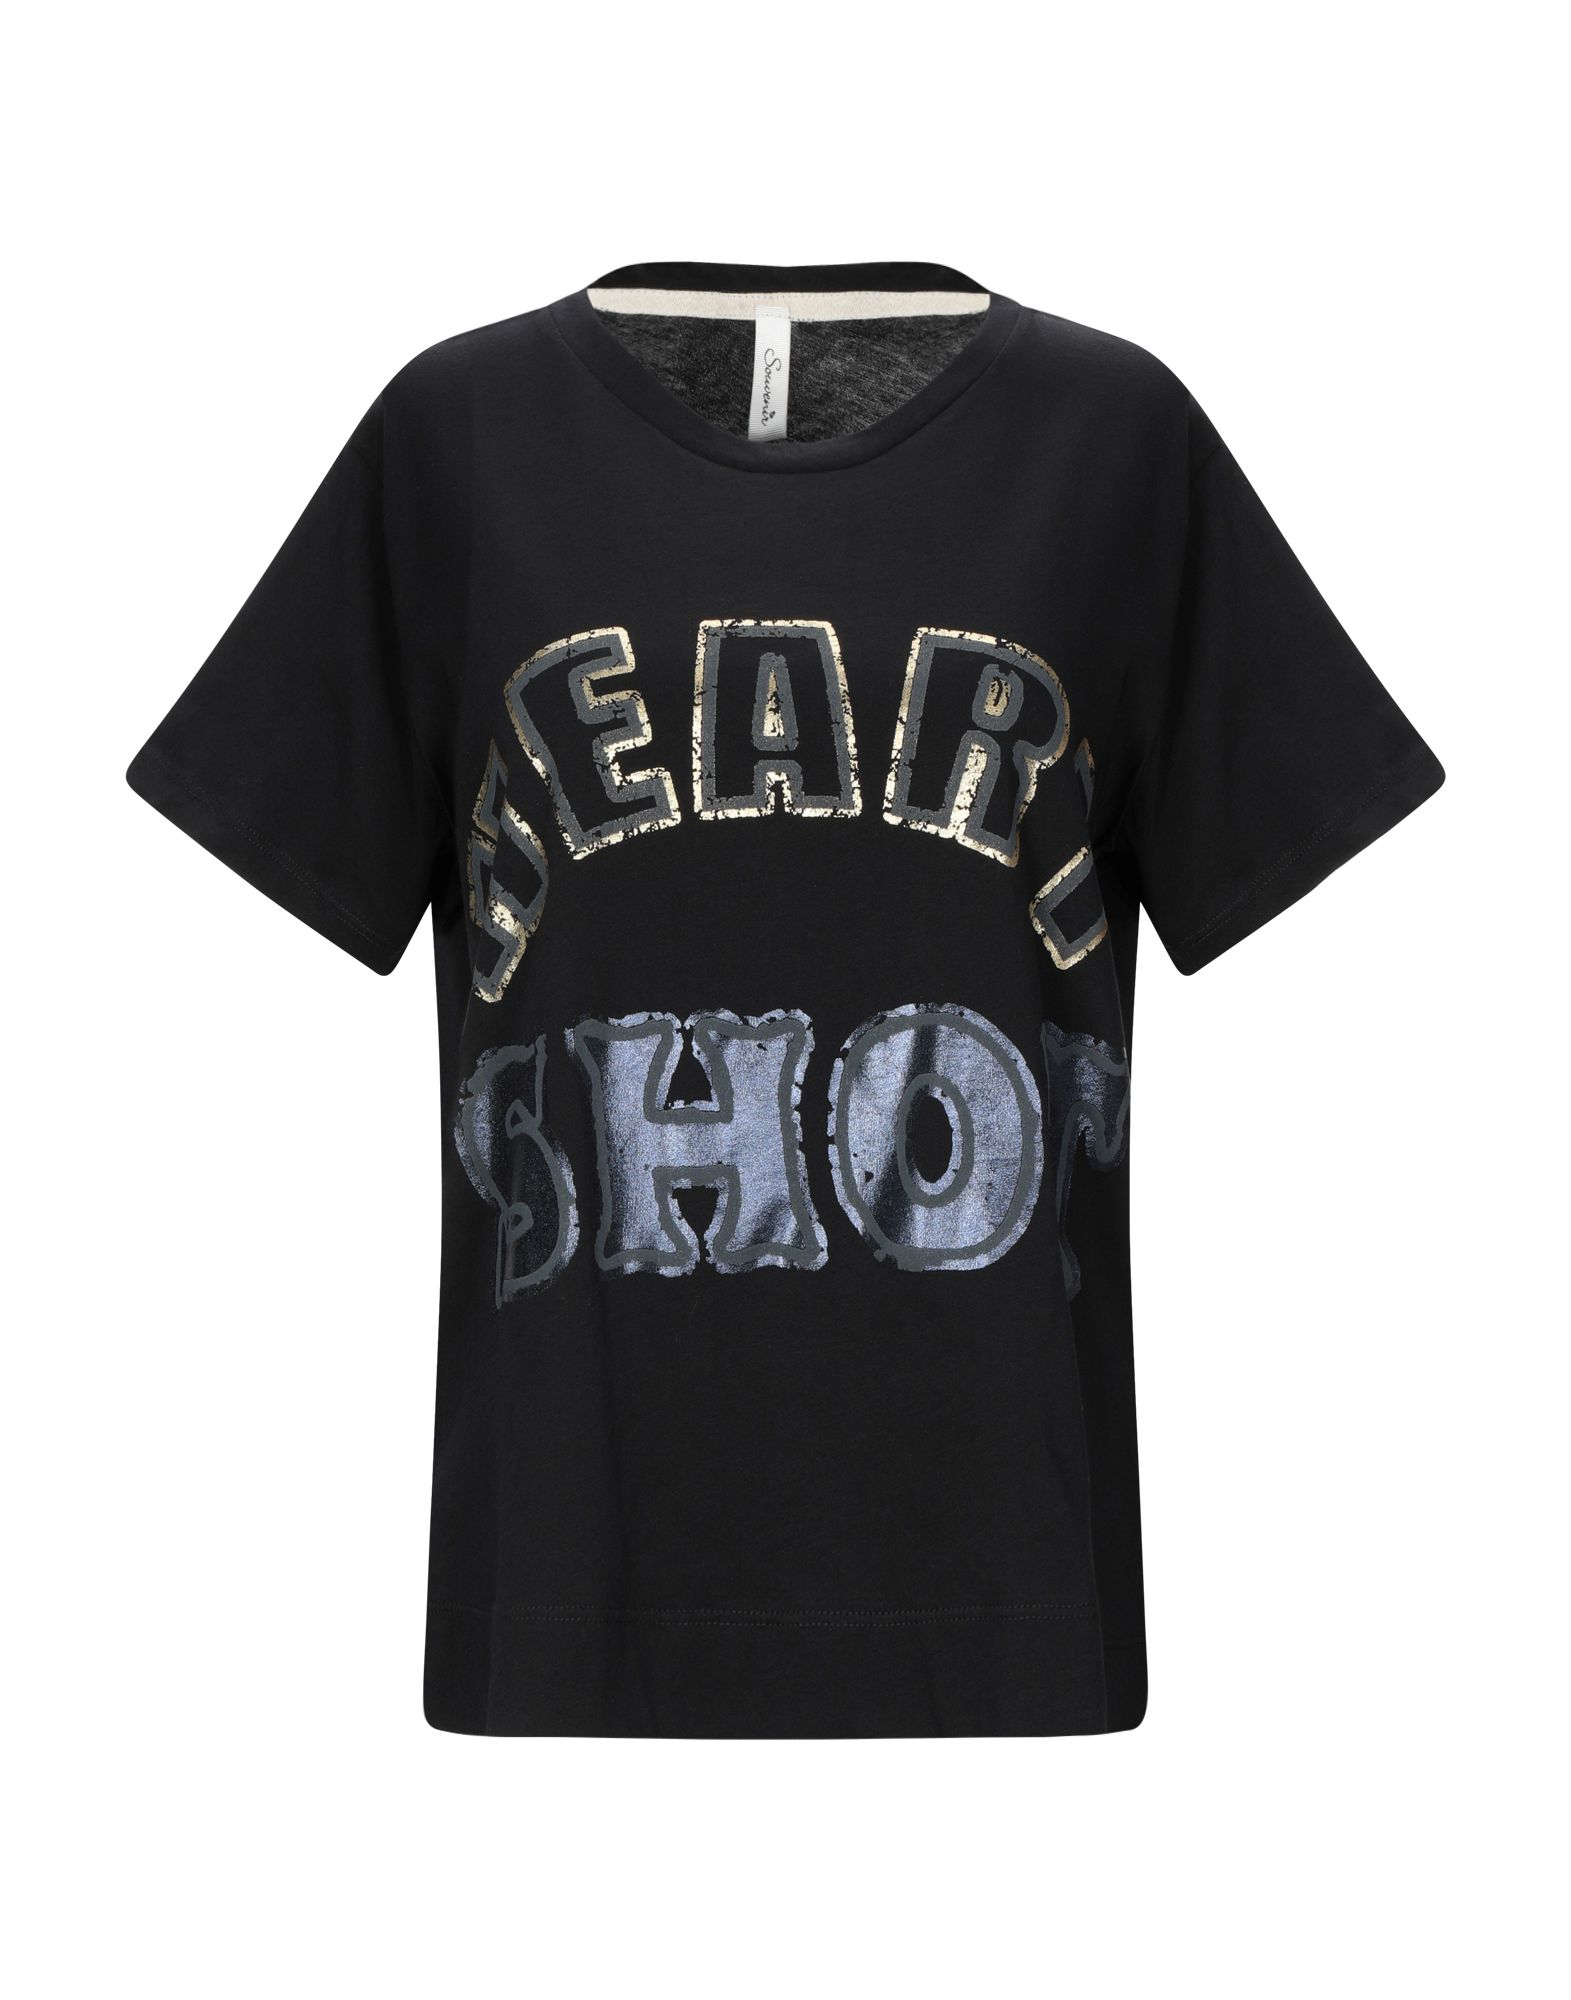 T-Shirt Souvenir donna donna donna - 12337225BJ 97e